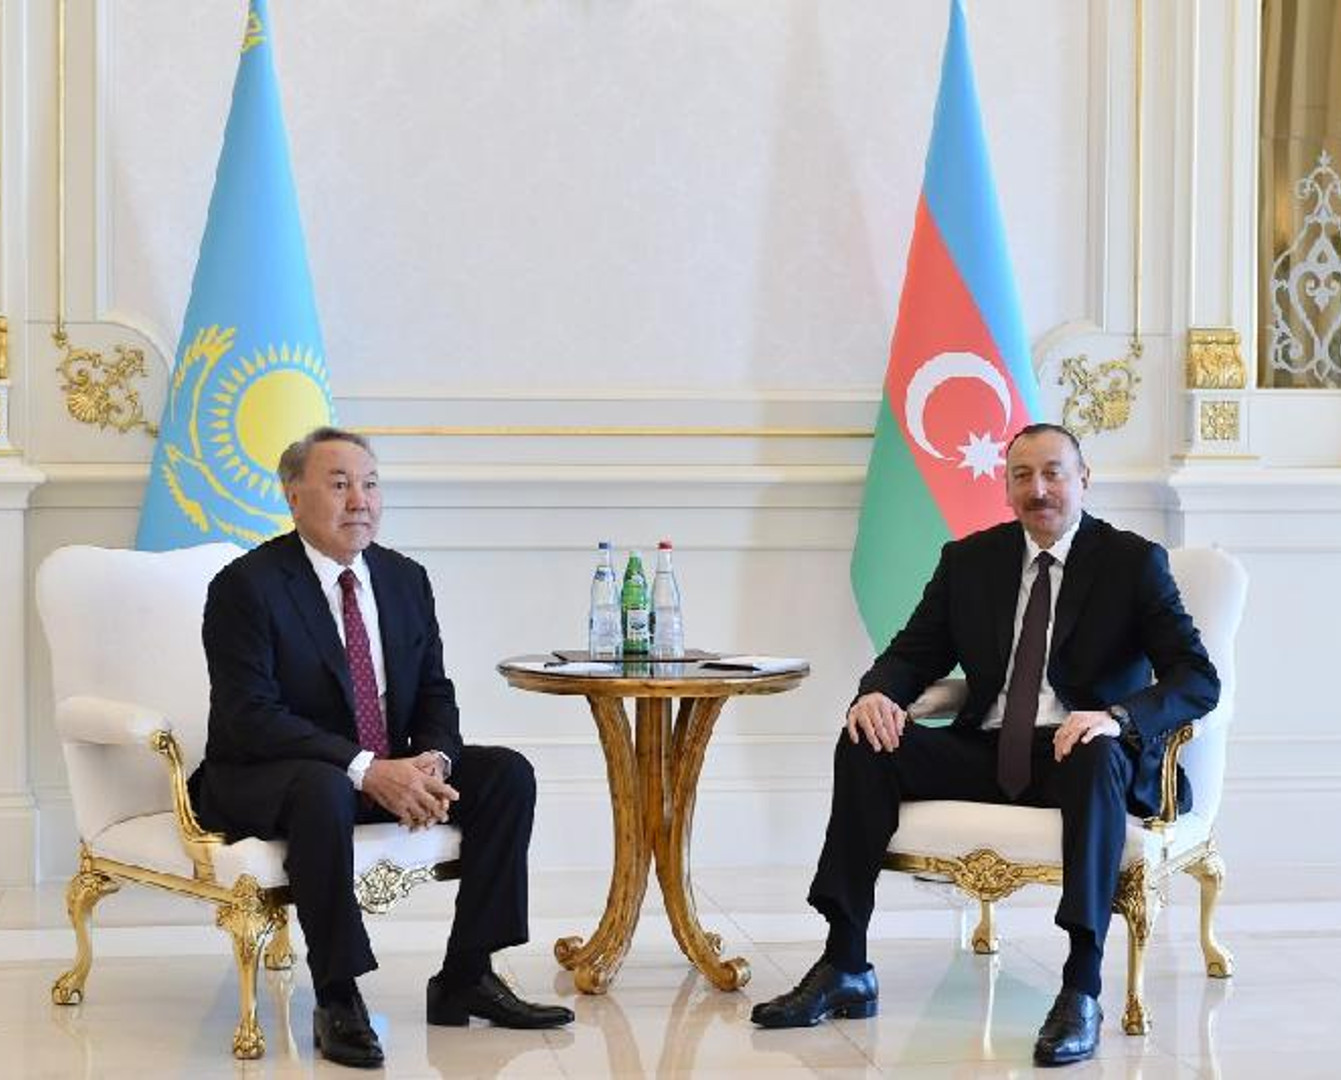 В резиденции «Загульба» прошла встреча президентов Азербайджана и Казахстана